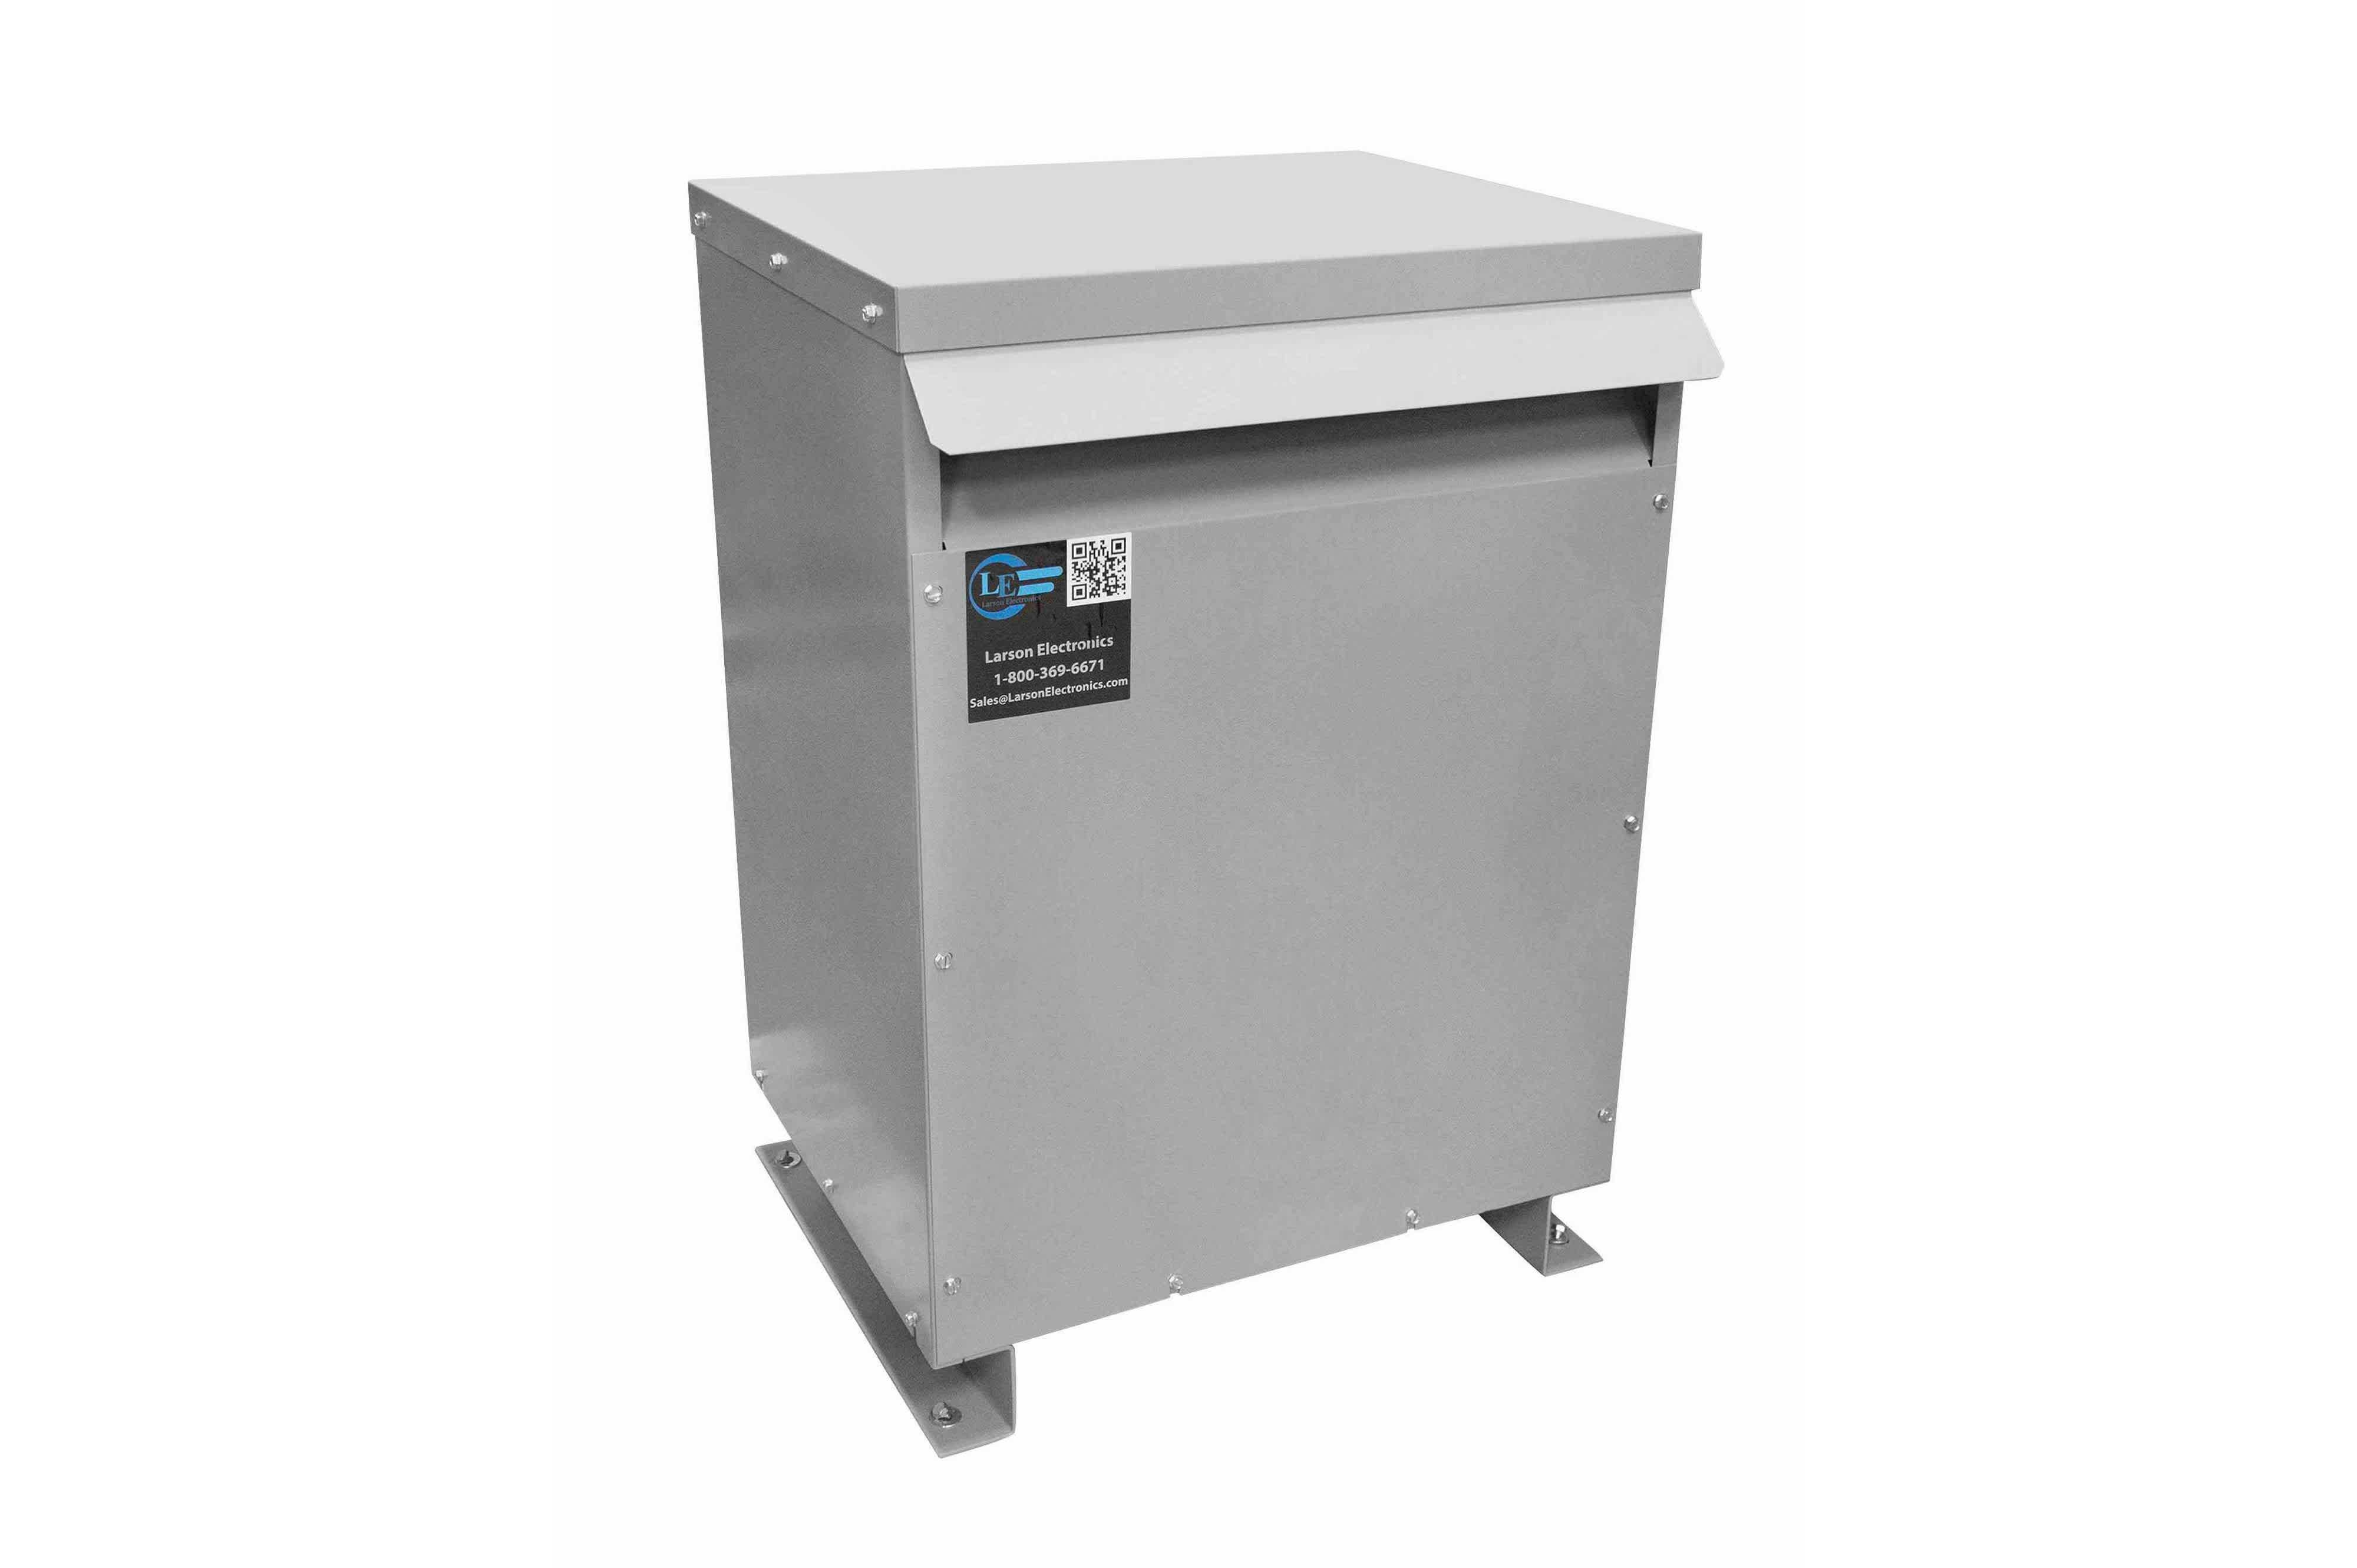 300 kVA 3PH DOE Transformer, 208V Delta Primary, 380Y/220 Wye-N Secondary, N3R, Ventilated, 60 Hz